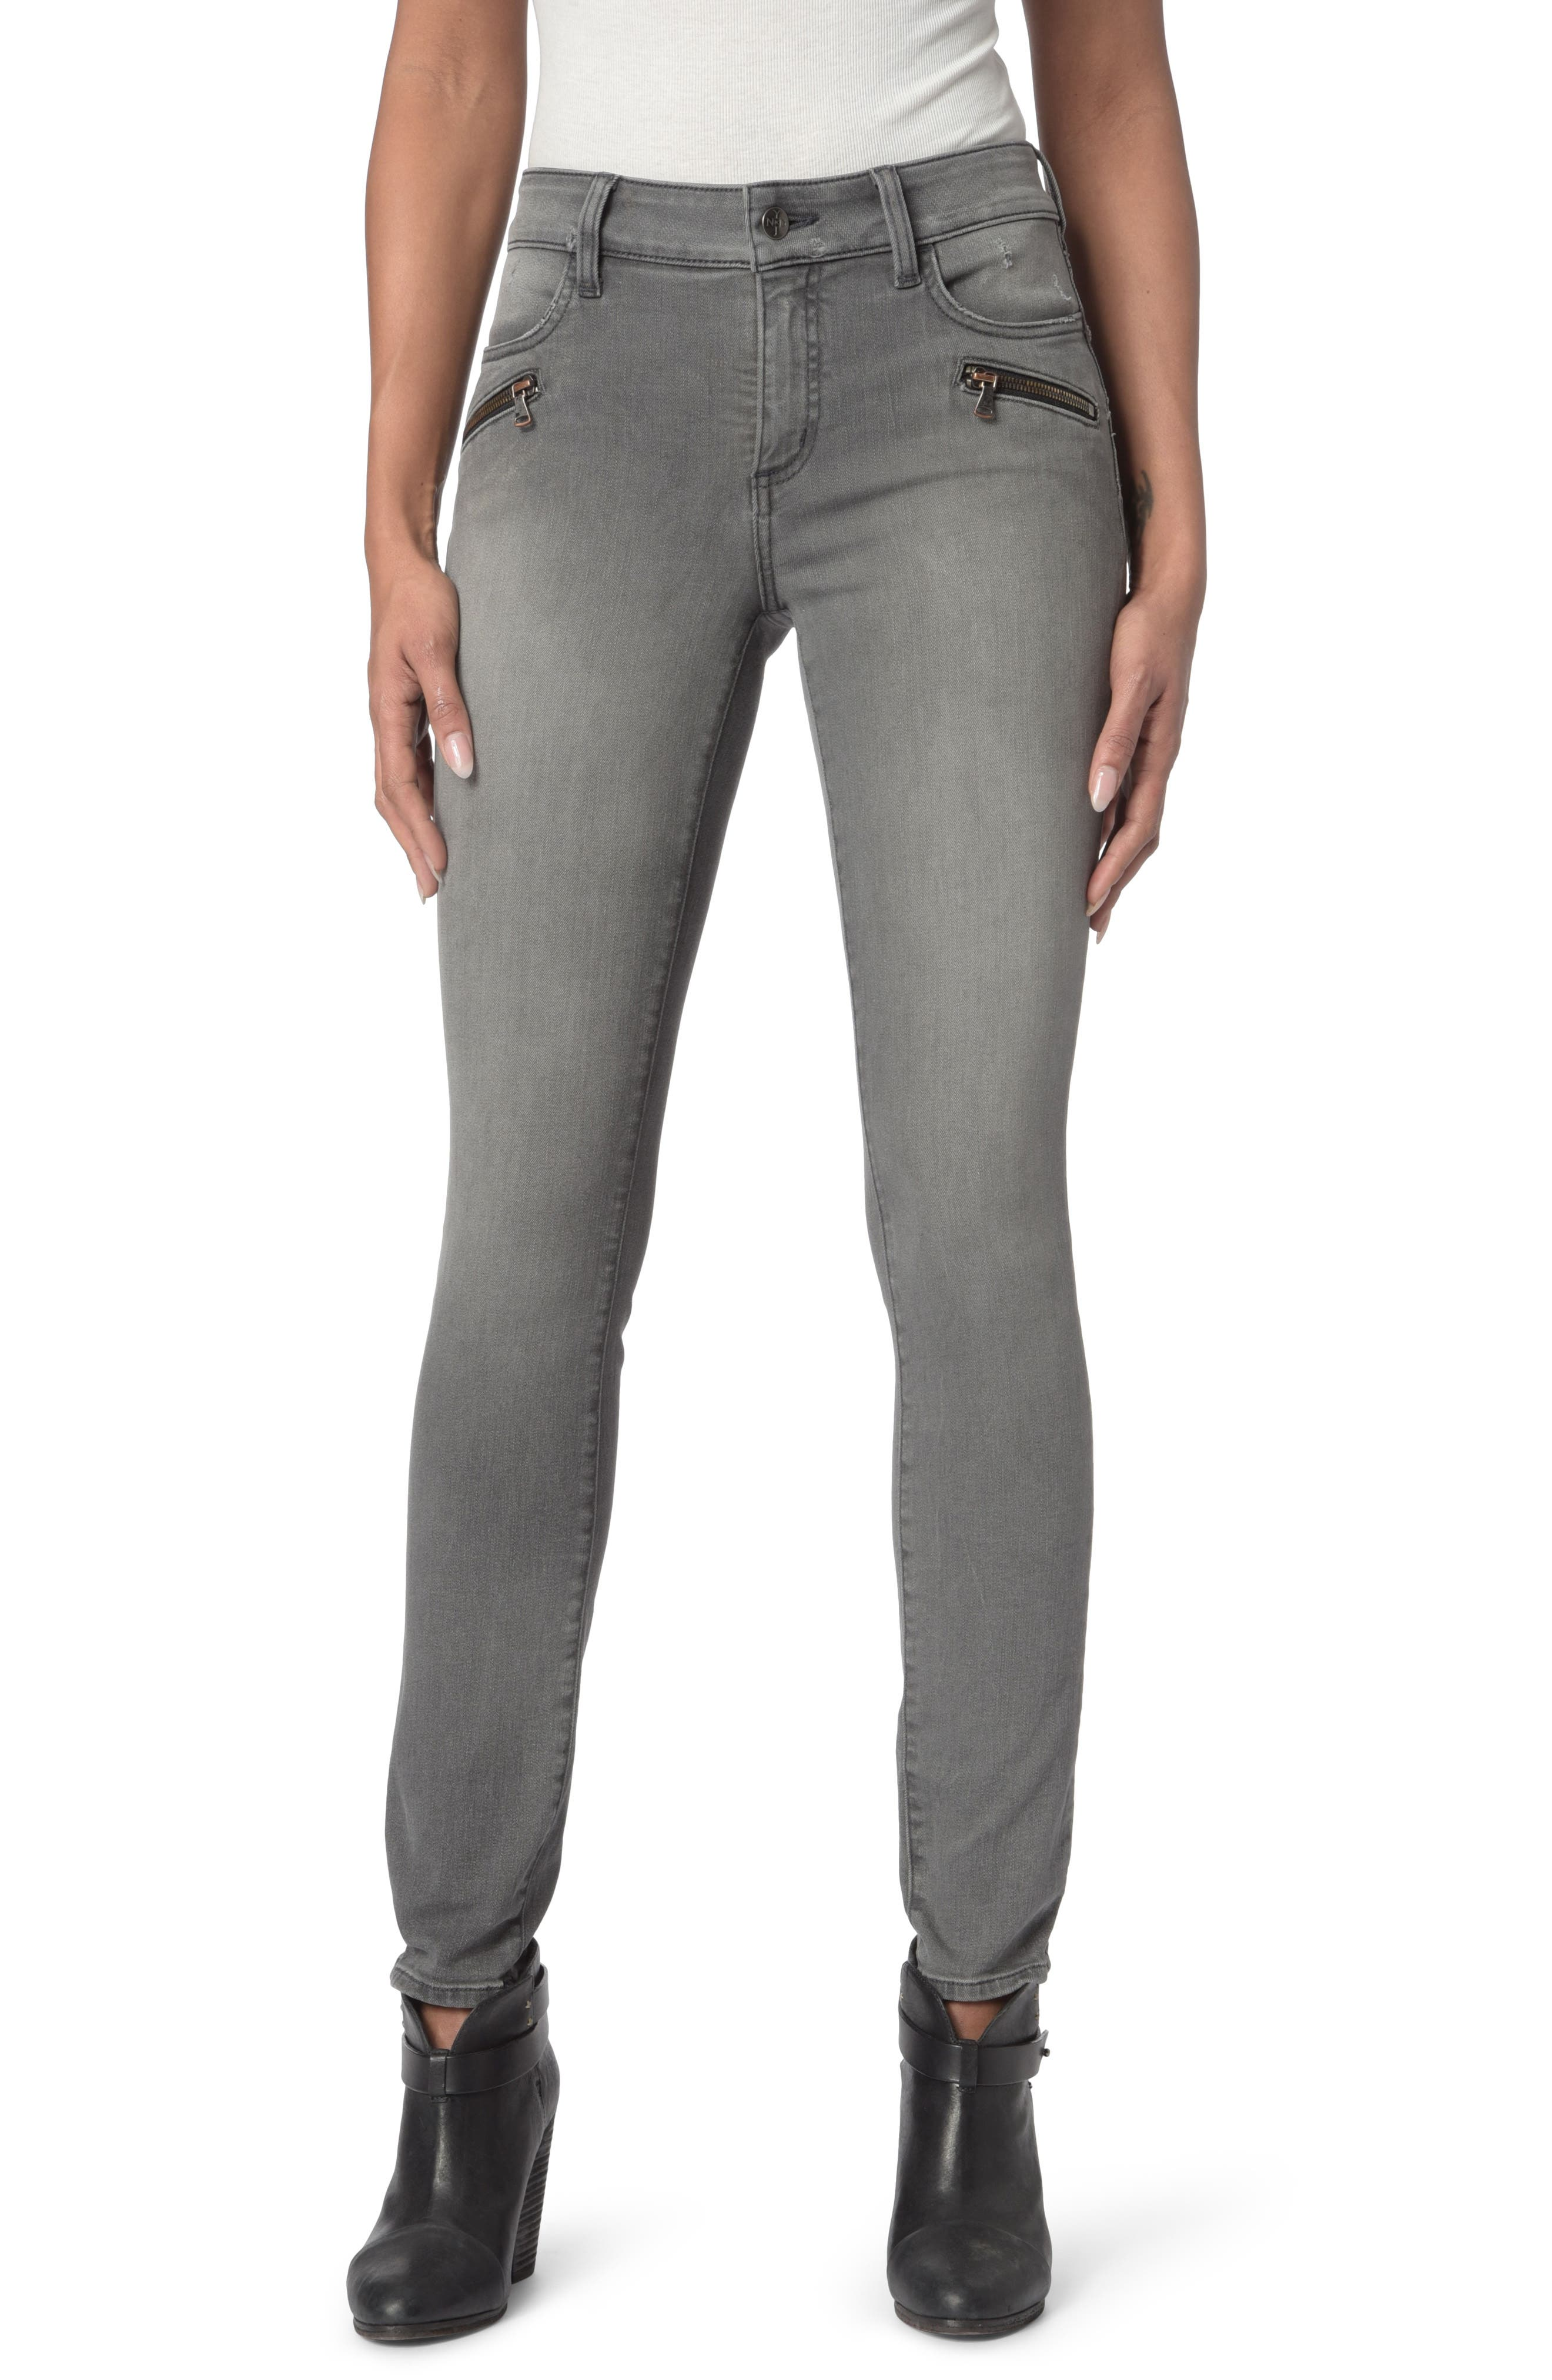 Alina Zippered Legging Jeans,                         Main,                         color, Alchemy